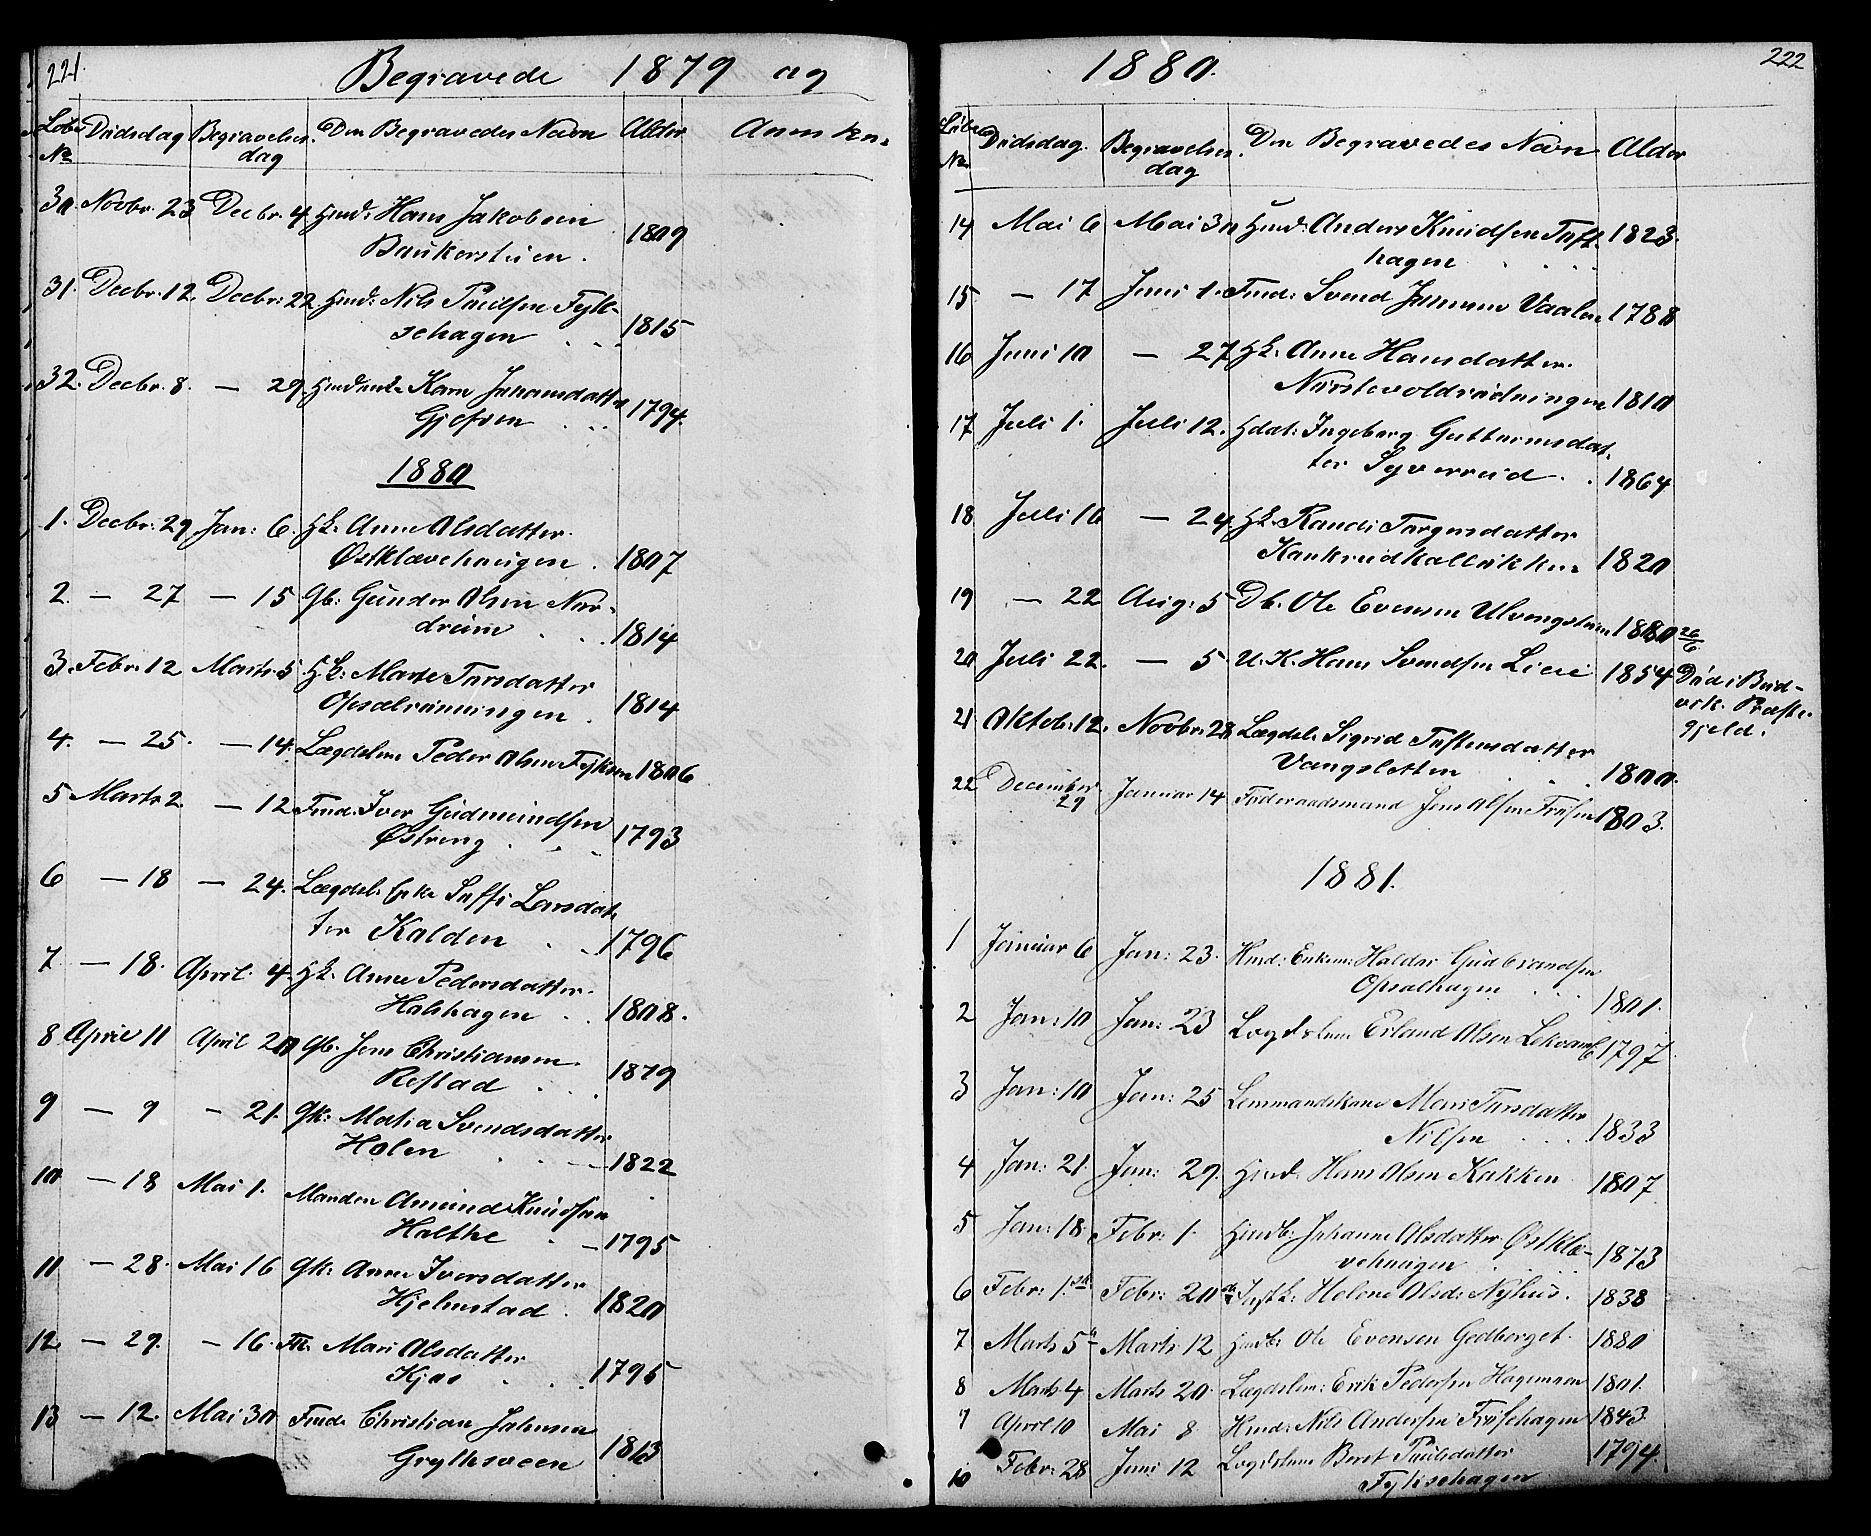 SAH, Østre Gausdal prestekontor, Klokkerbok nr. 1, 1863-1893, s. 221-222